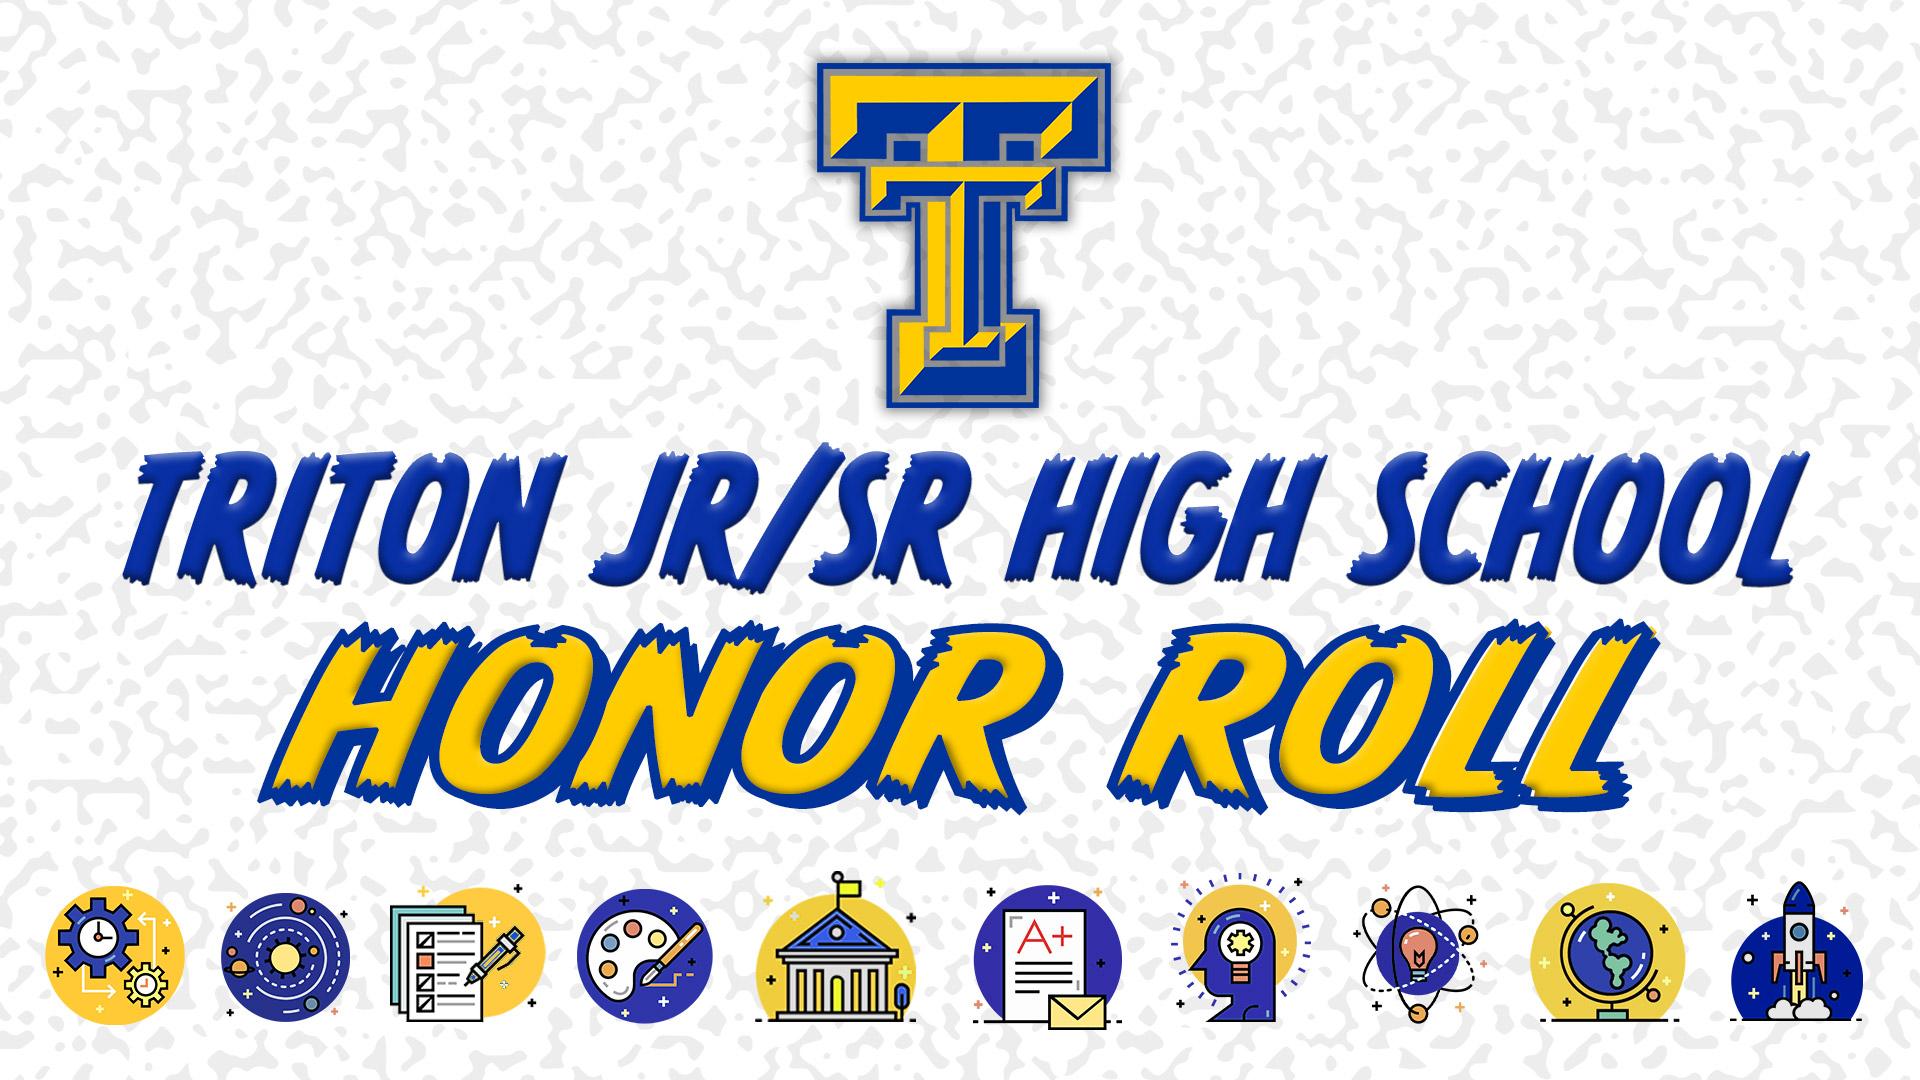 TJSHS Honor Roll | 2020-2021 | Term 2 Grading Period 1